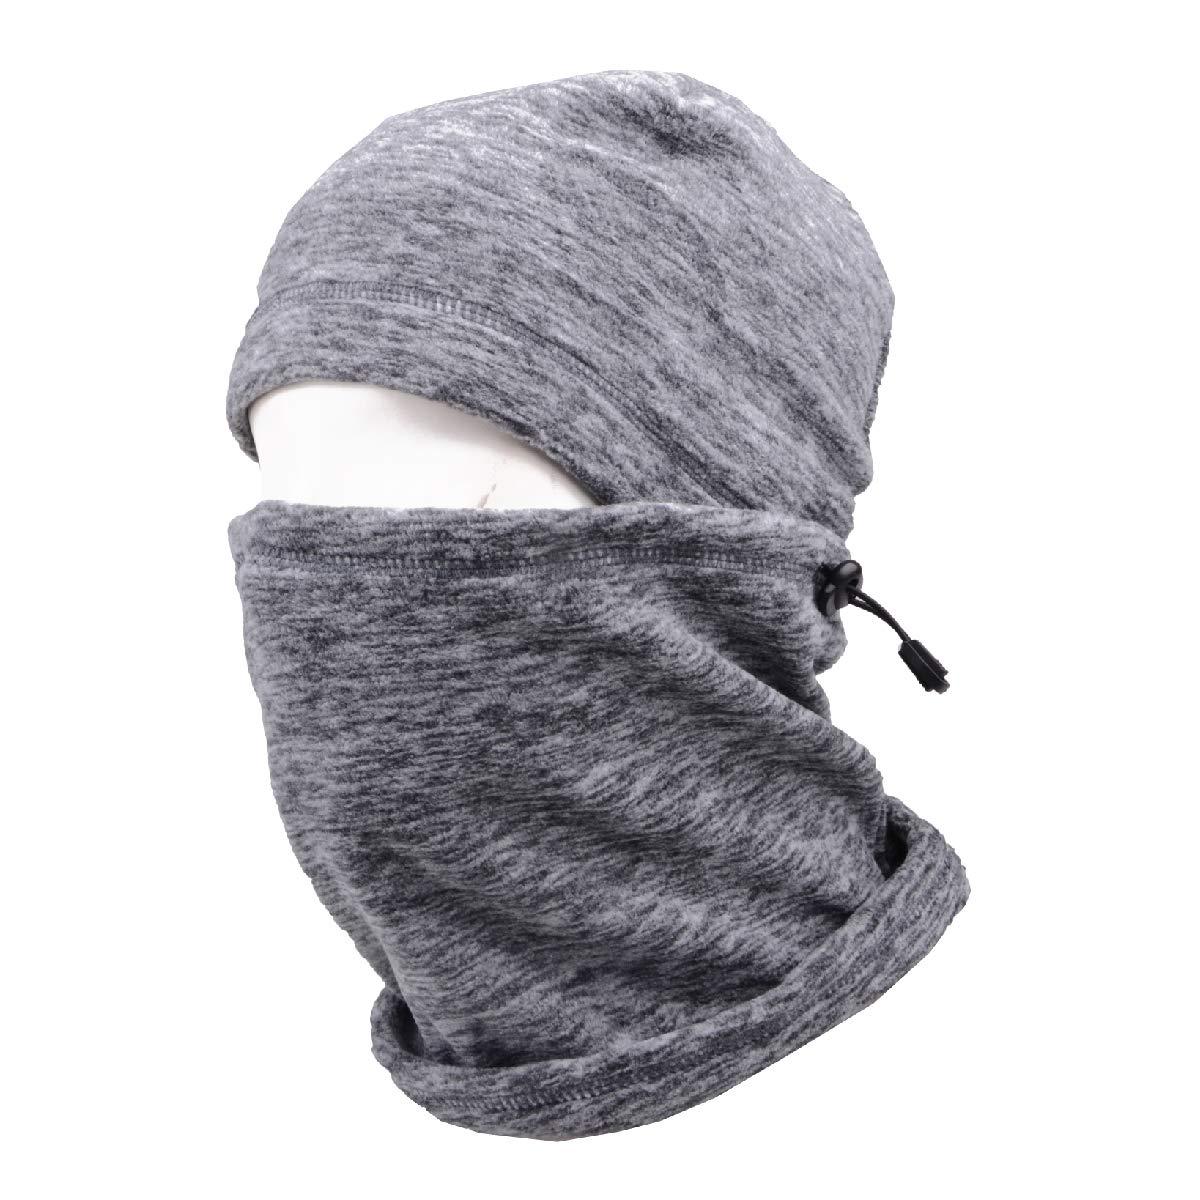 TRIWONDER Pasamontañas Sombrero de Campana Sombrero Polar Térmico Máscara Facial Cuello Calentador Invierno Máscara de esquí Cubierta de Rostro Completo Cap (Gris - 17) OS1710GY